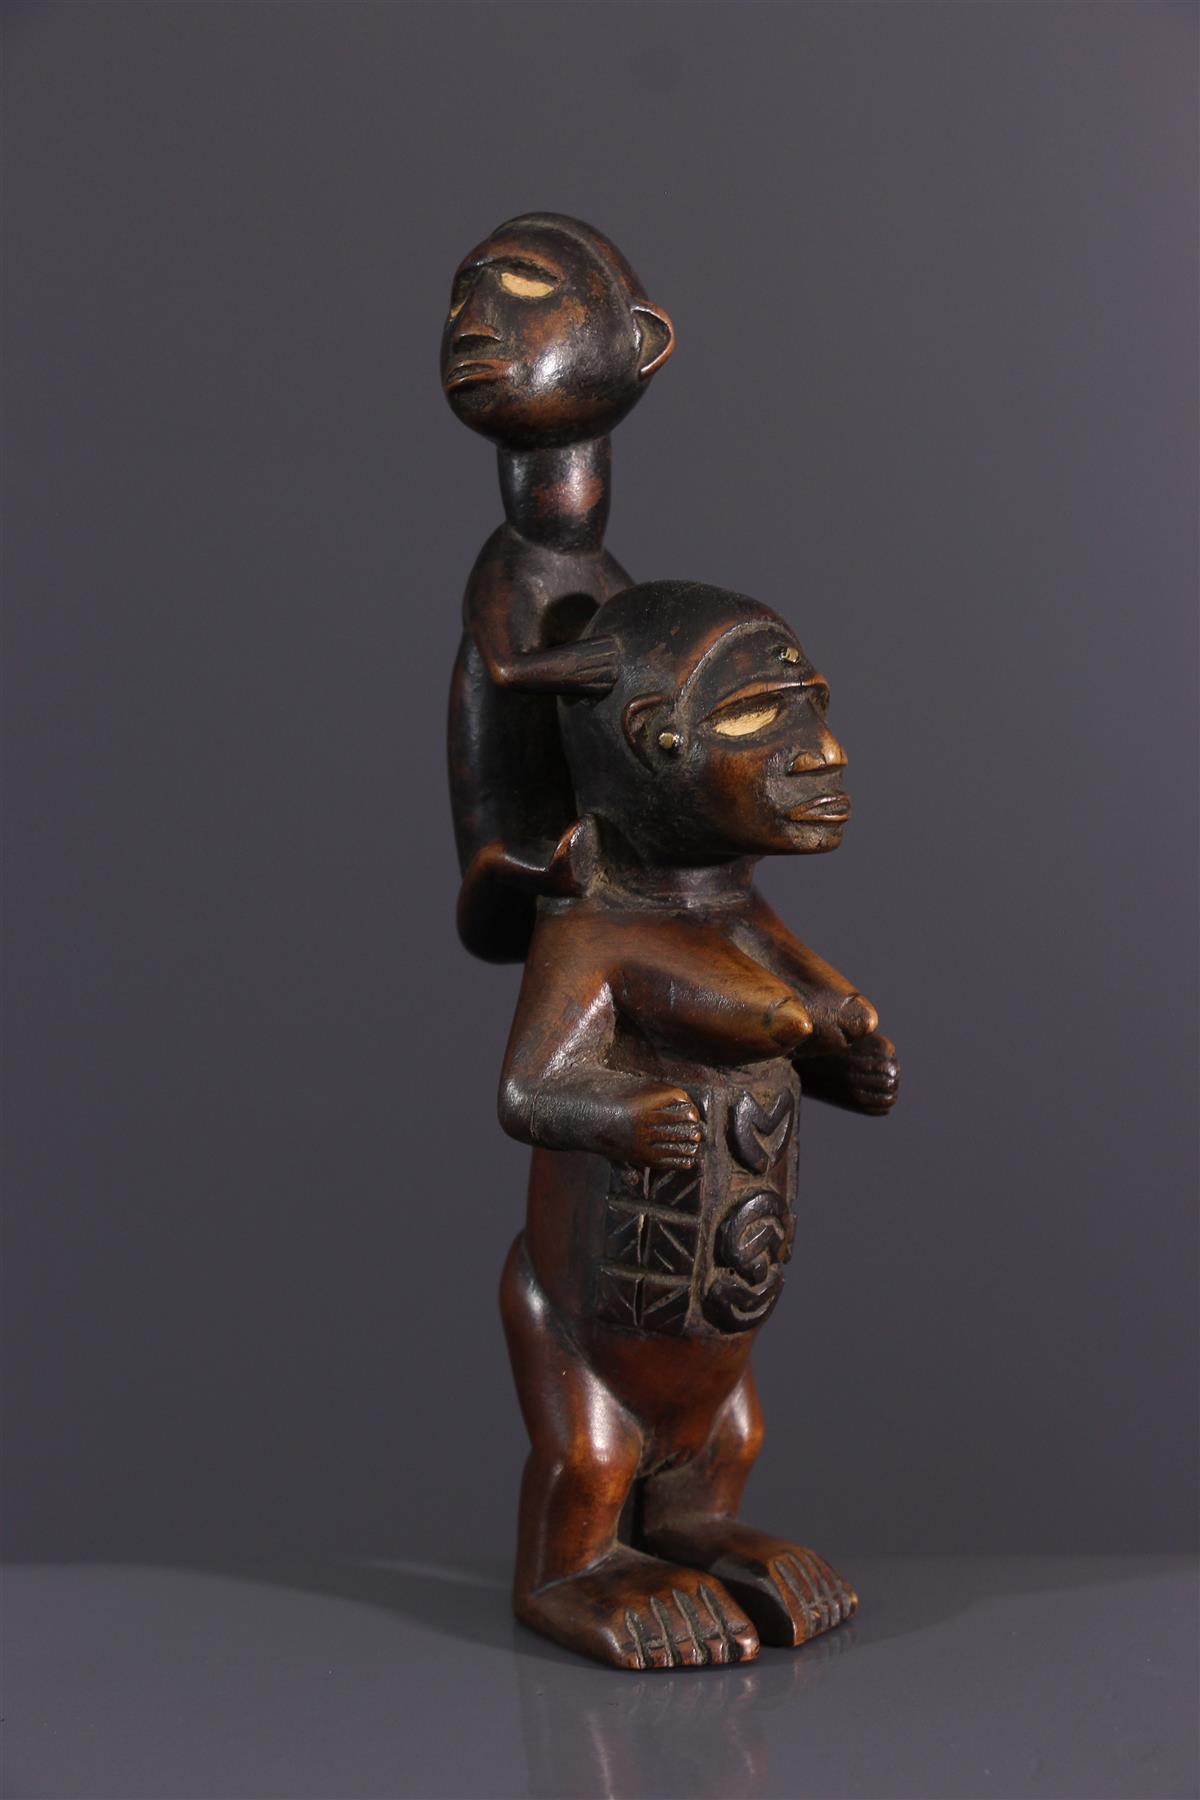 Statuette Bembe - African art